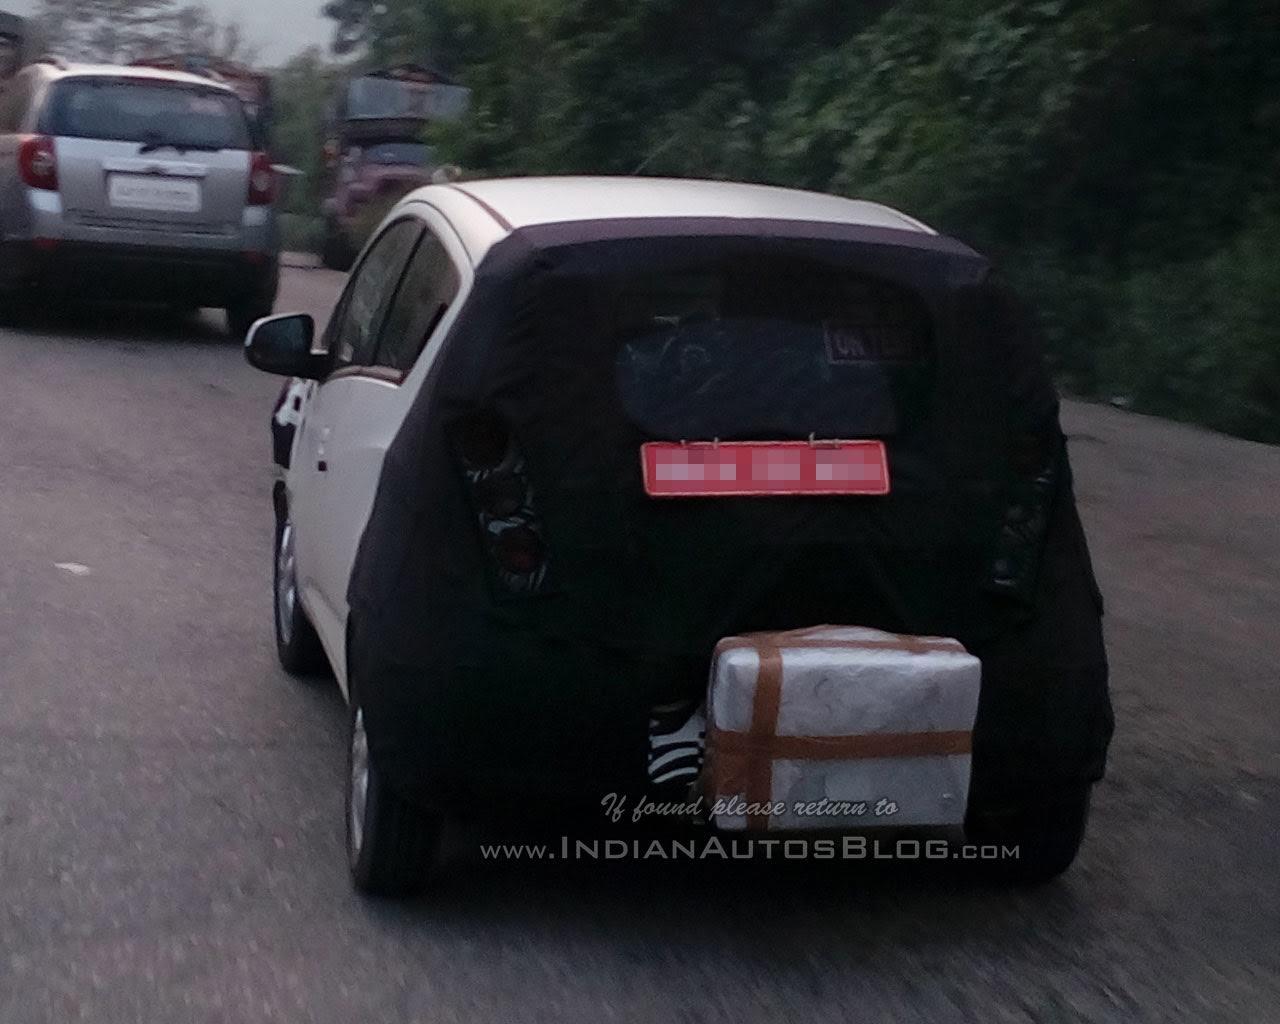 Next-gen Chevrolet Beat taillamp spied testing by IAB reader